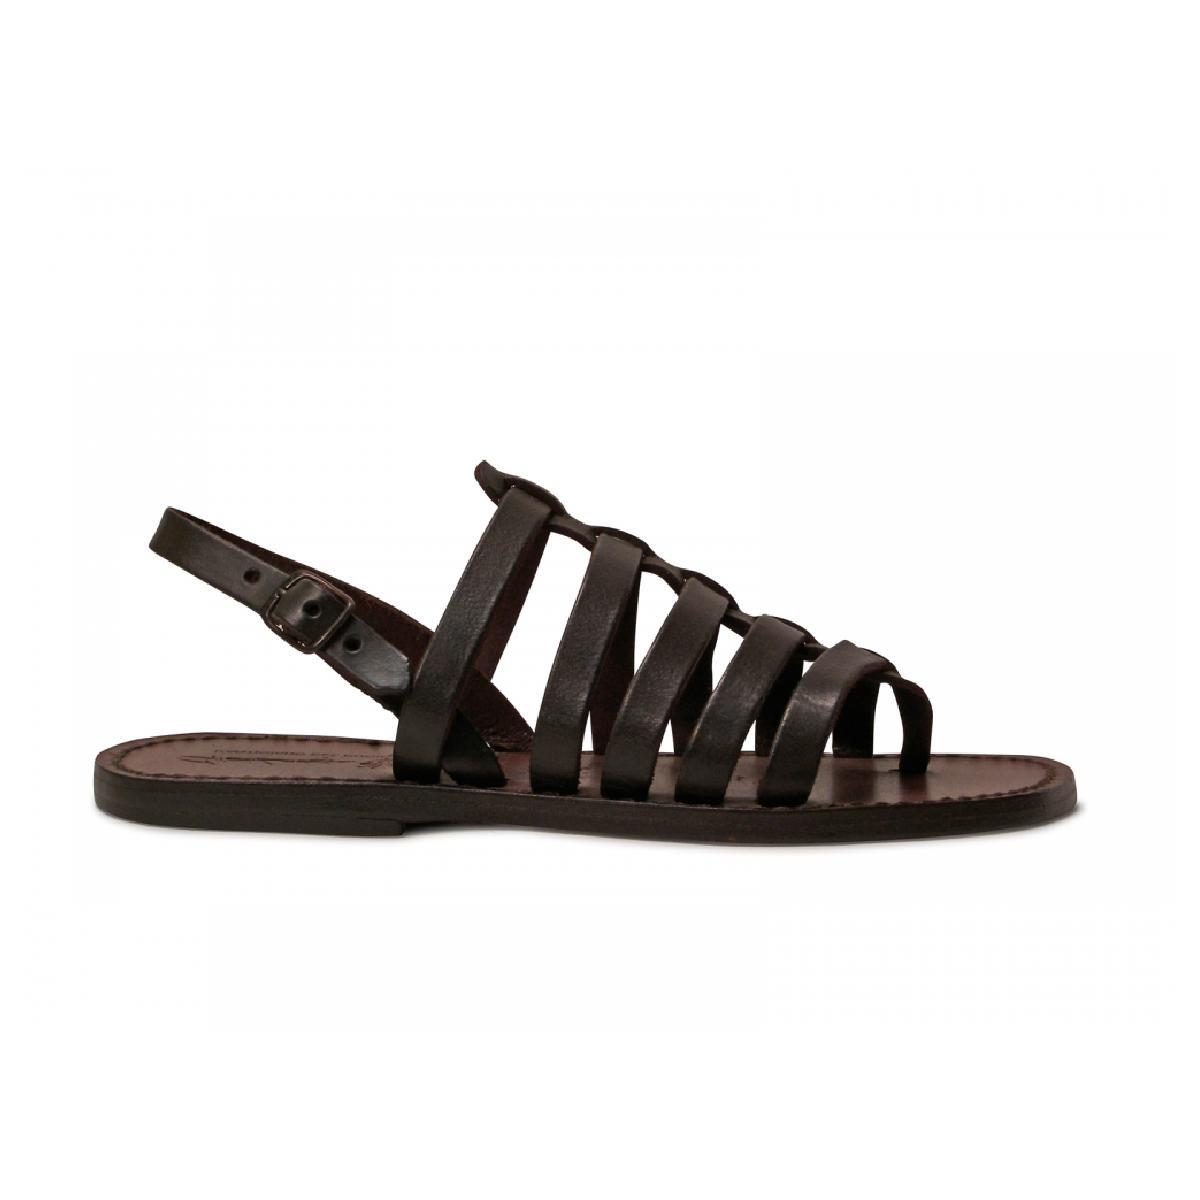 Awesome Women Leather SandalGreek Handmade Summer FlatsGladiator Sandals